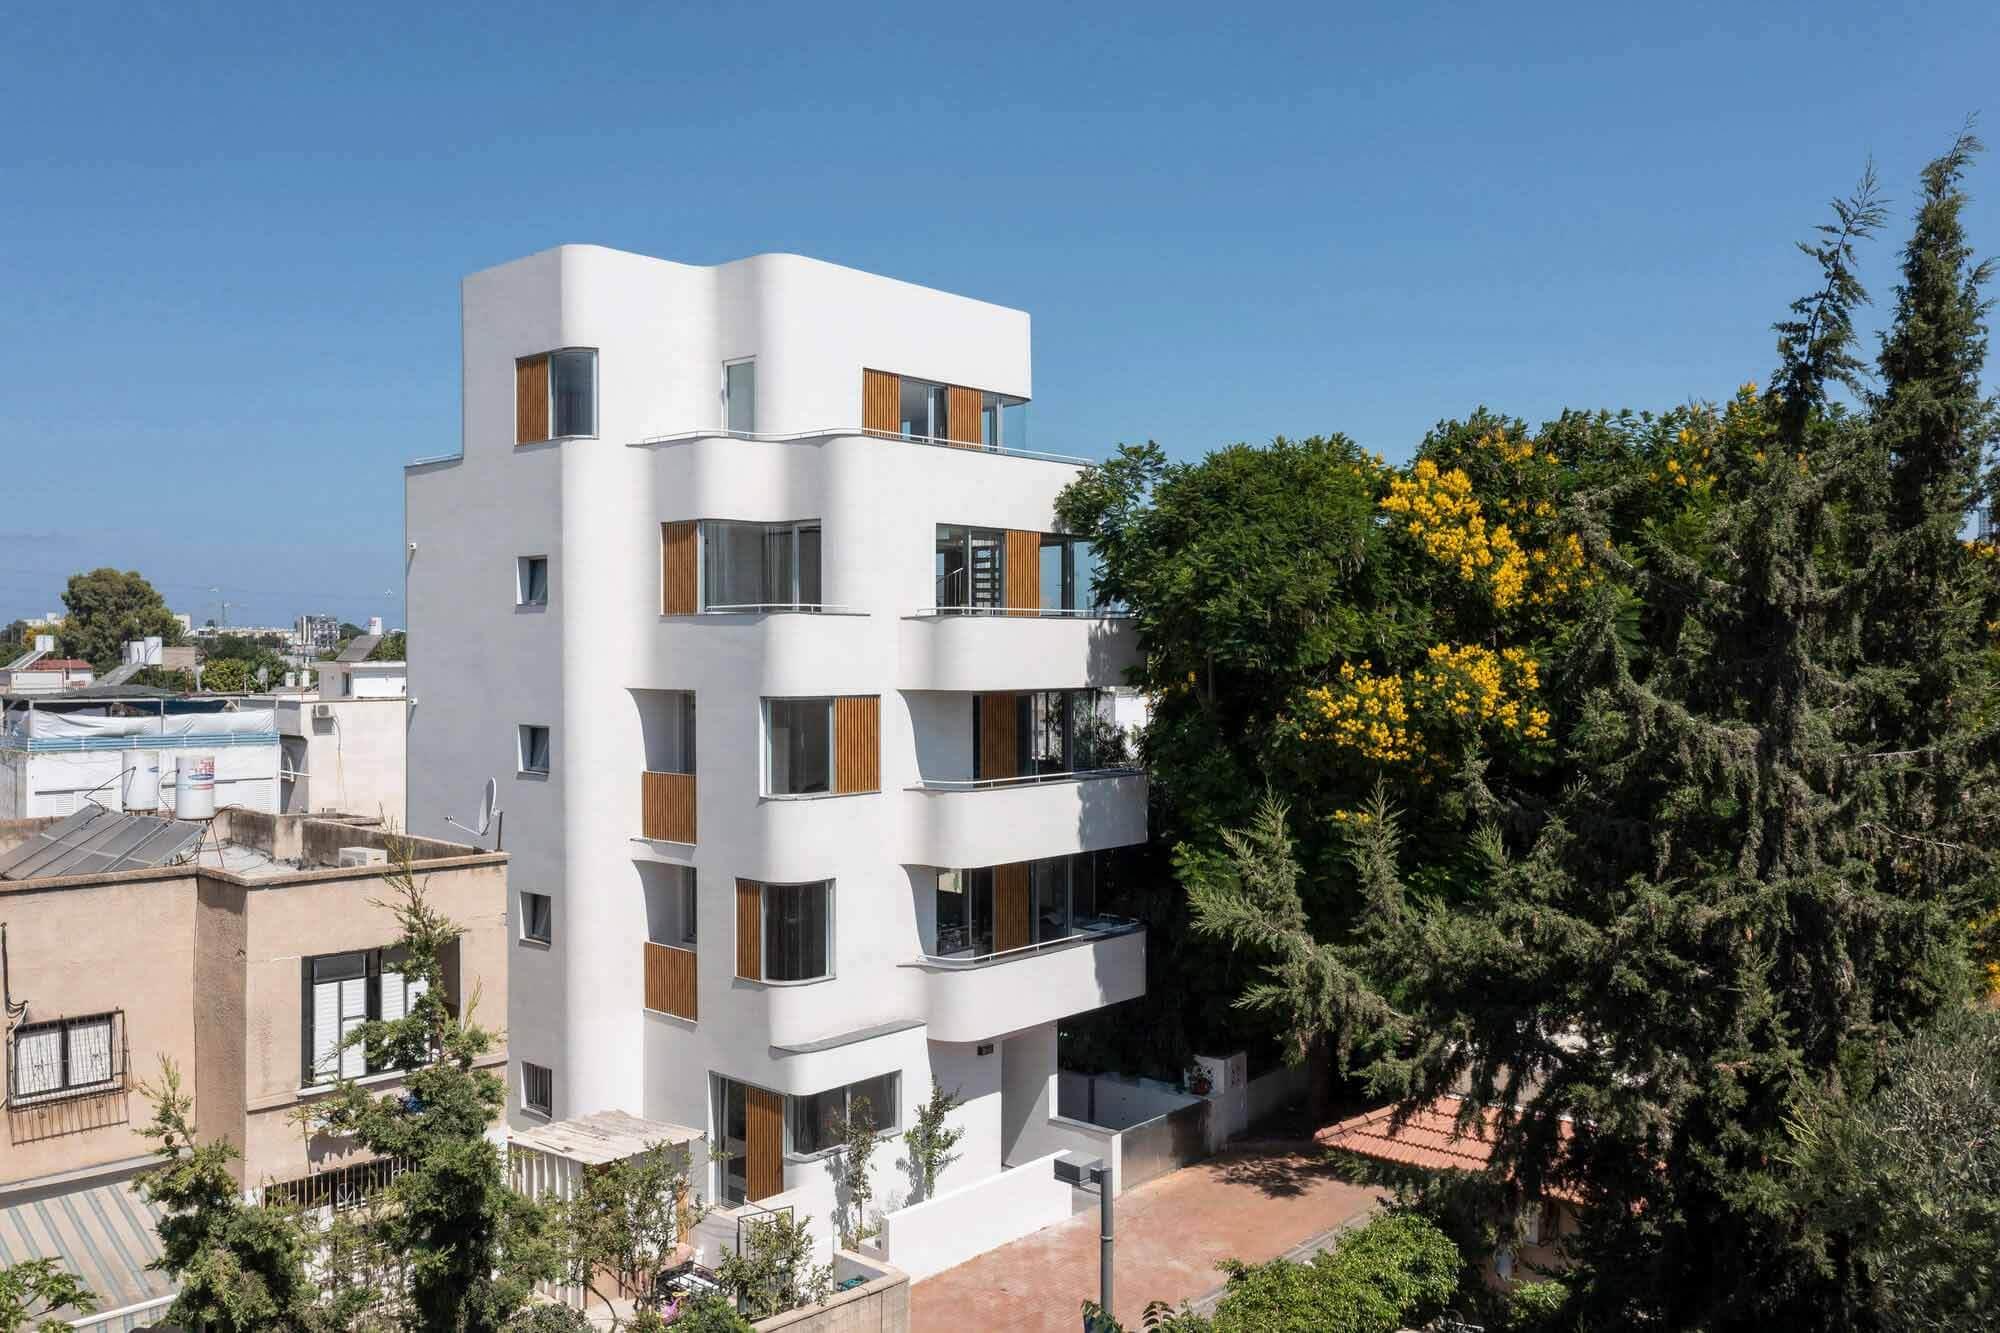 42 Shvat Street Apartments / Yaniv Pardo Architects